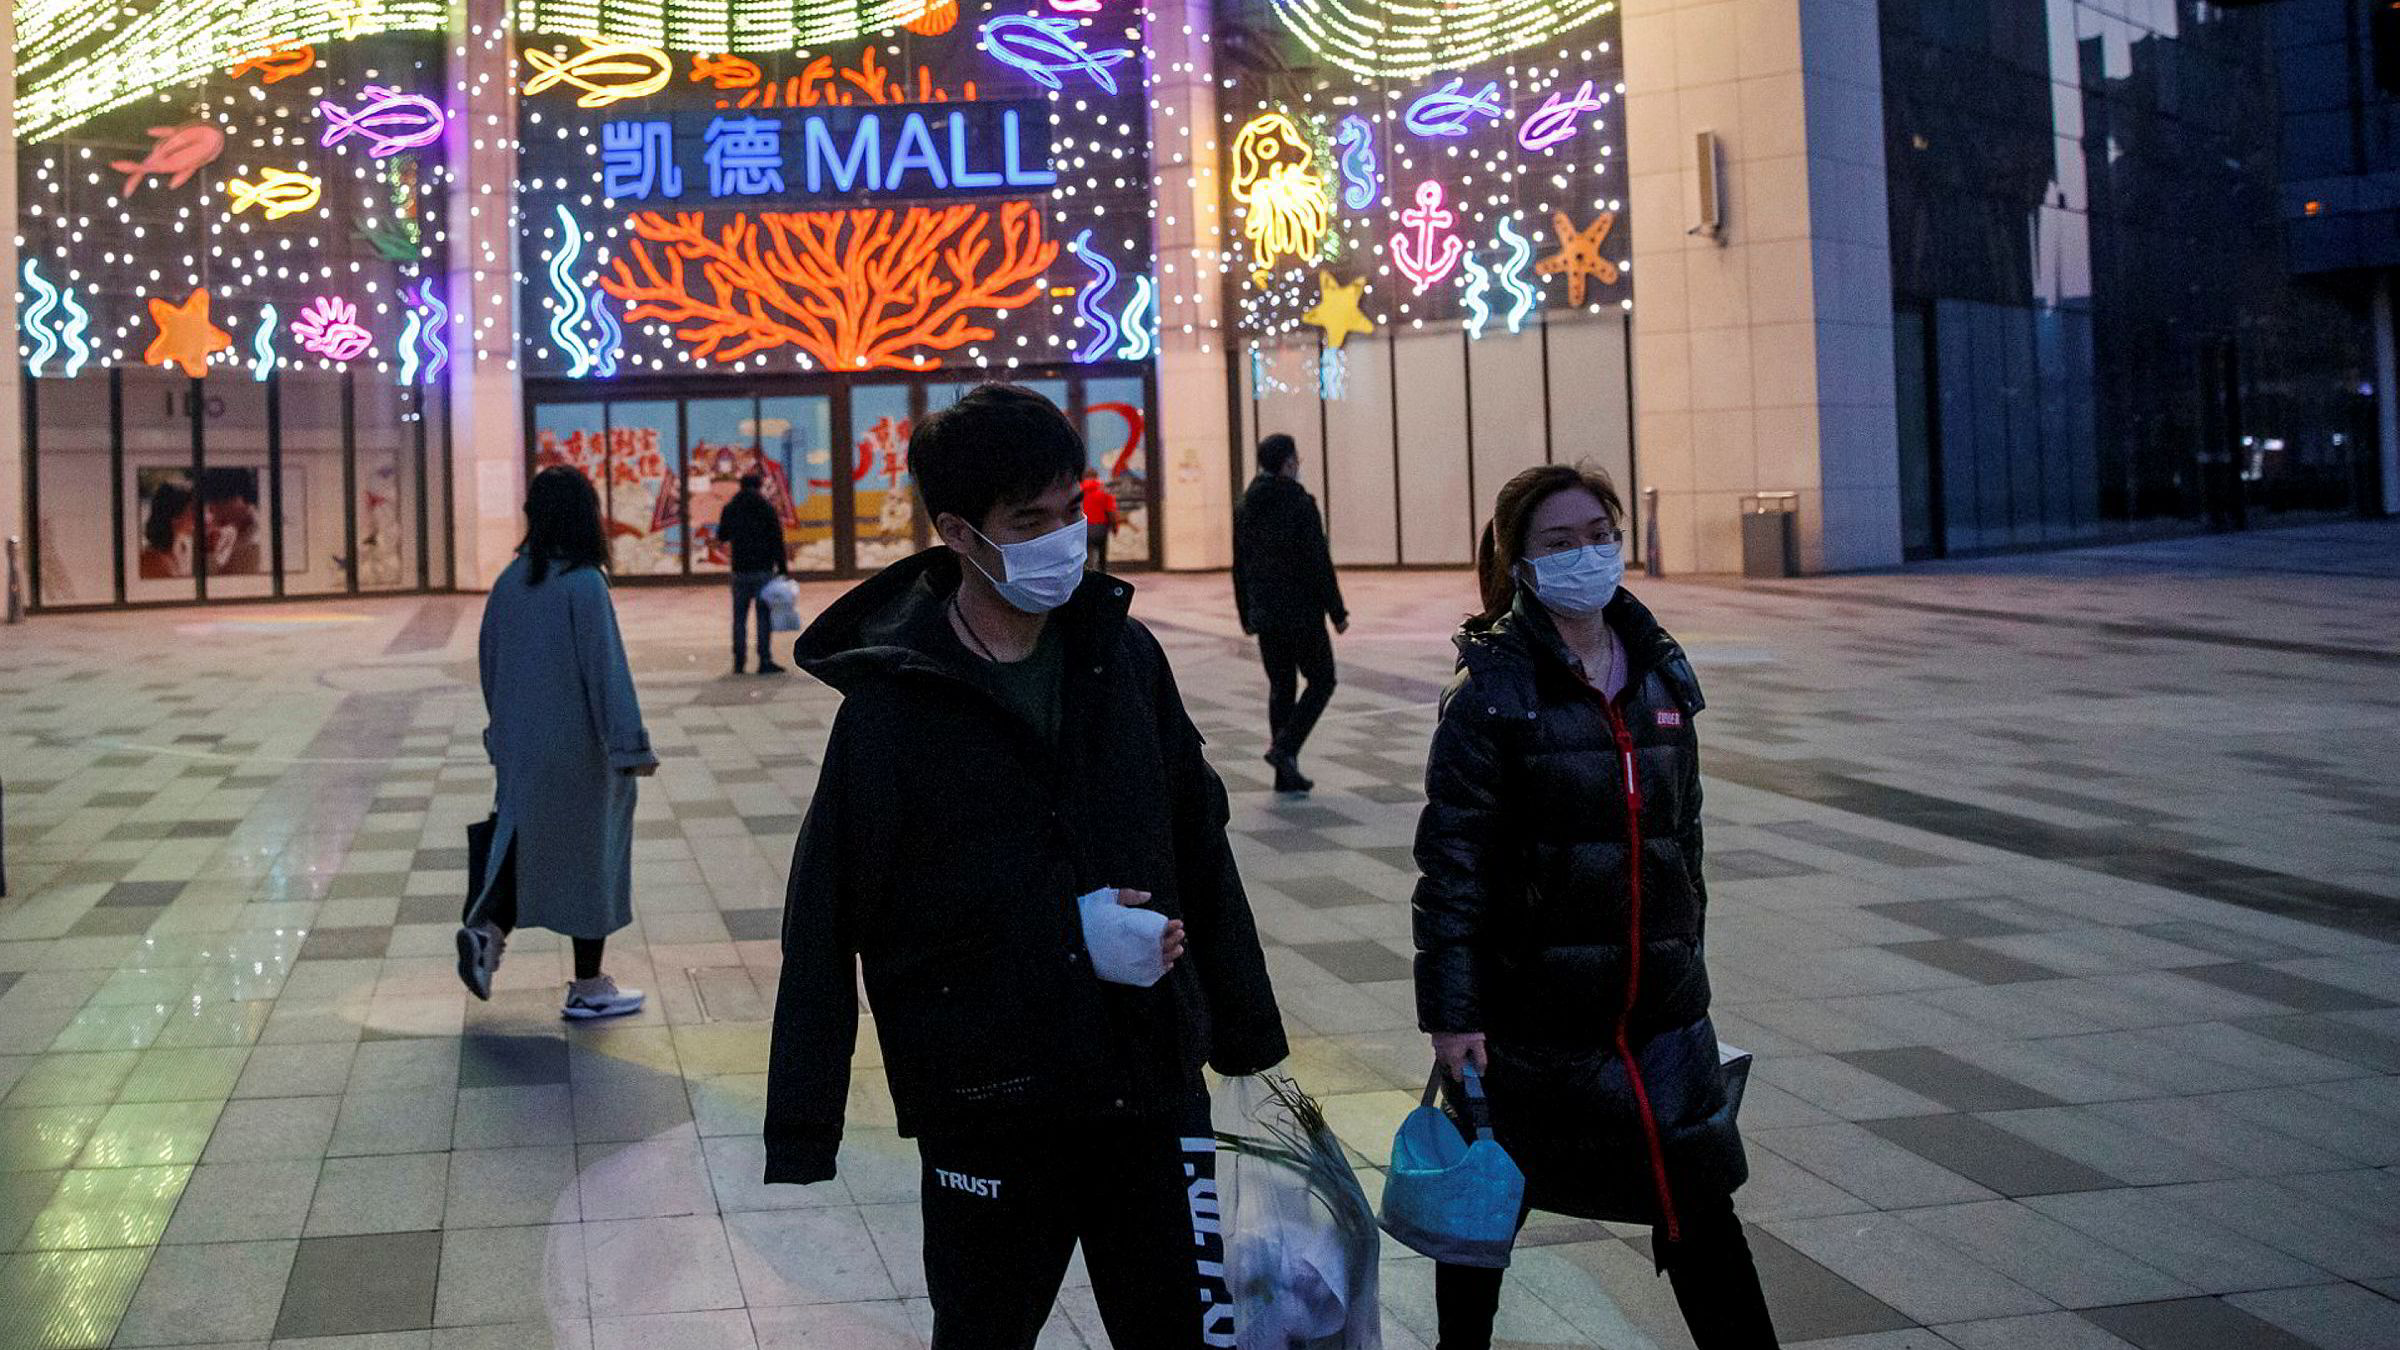 Kina har lagt frem langt verre økonomiske statistikker for årets to første måneder enn ventet. Det kan bli verre i mars.